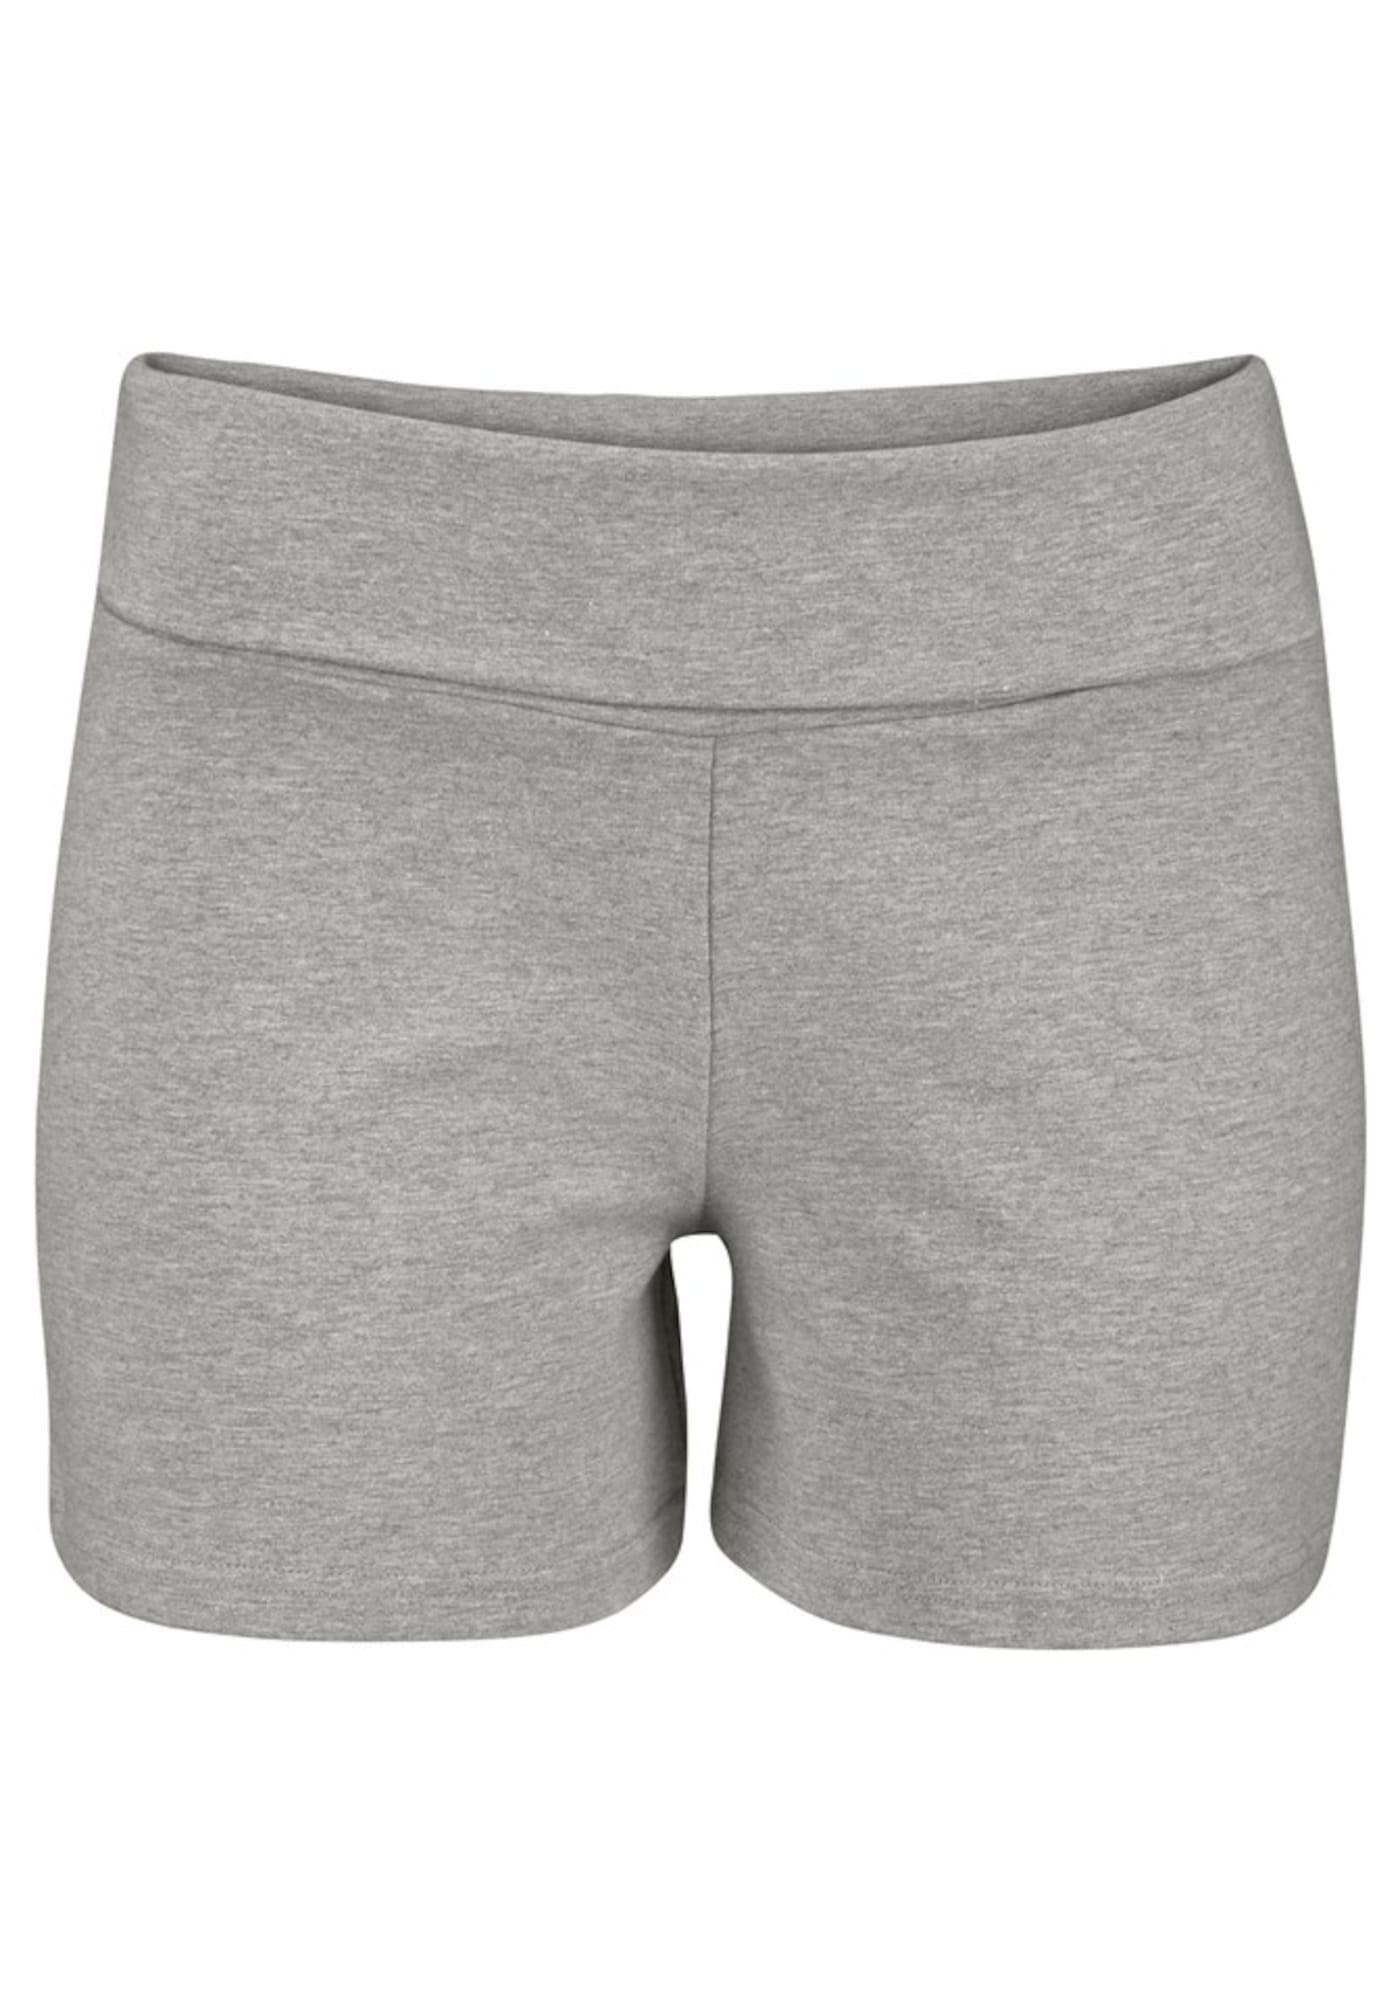 BEACH TIME Kelnės margai pilka